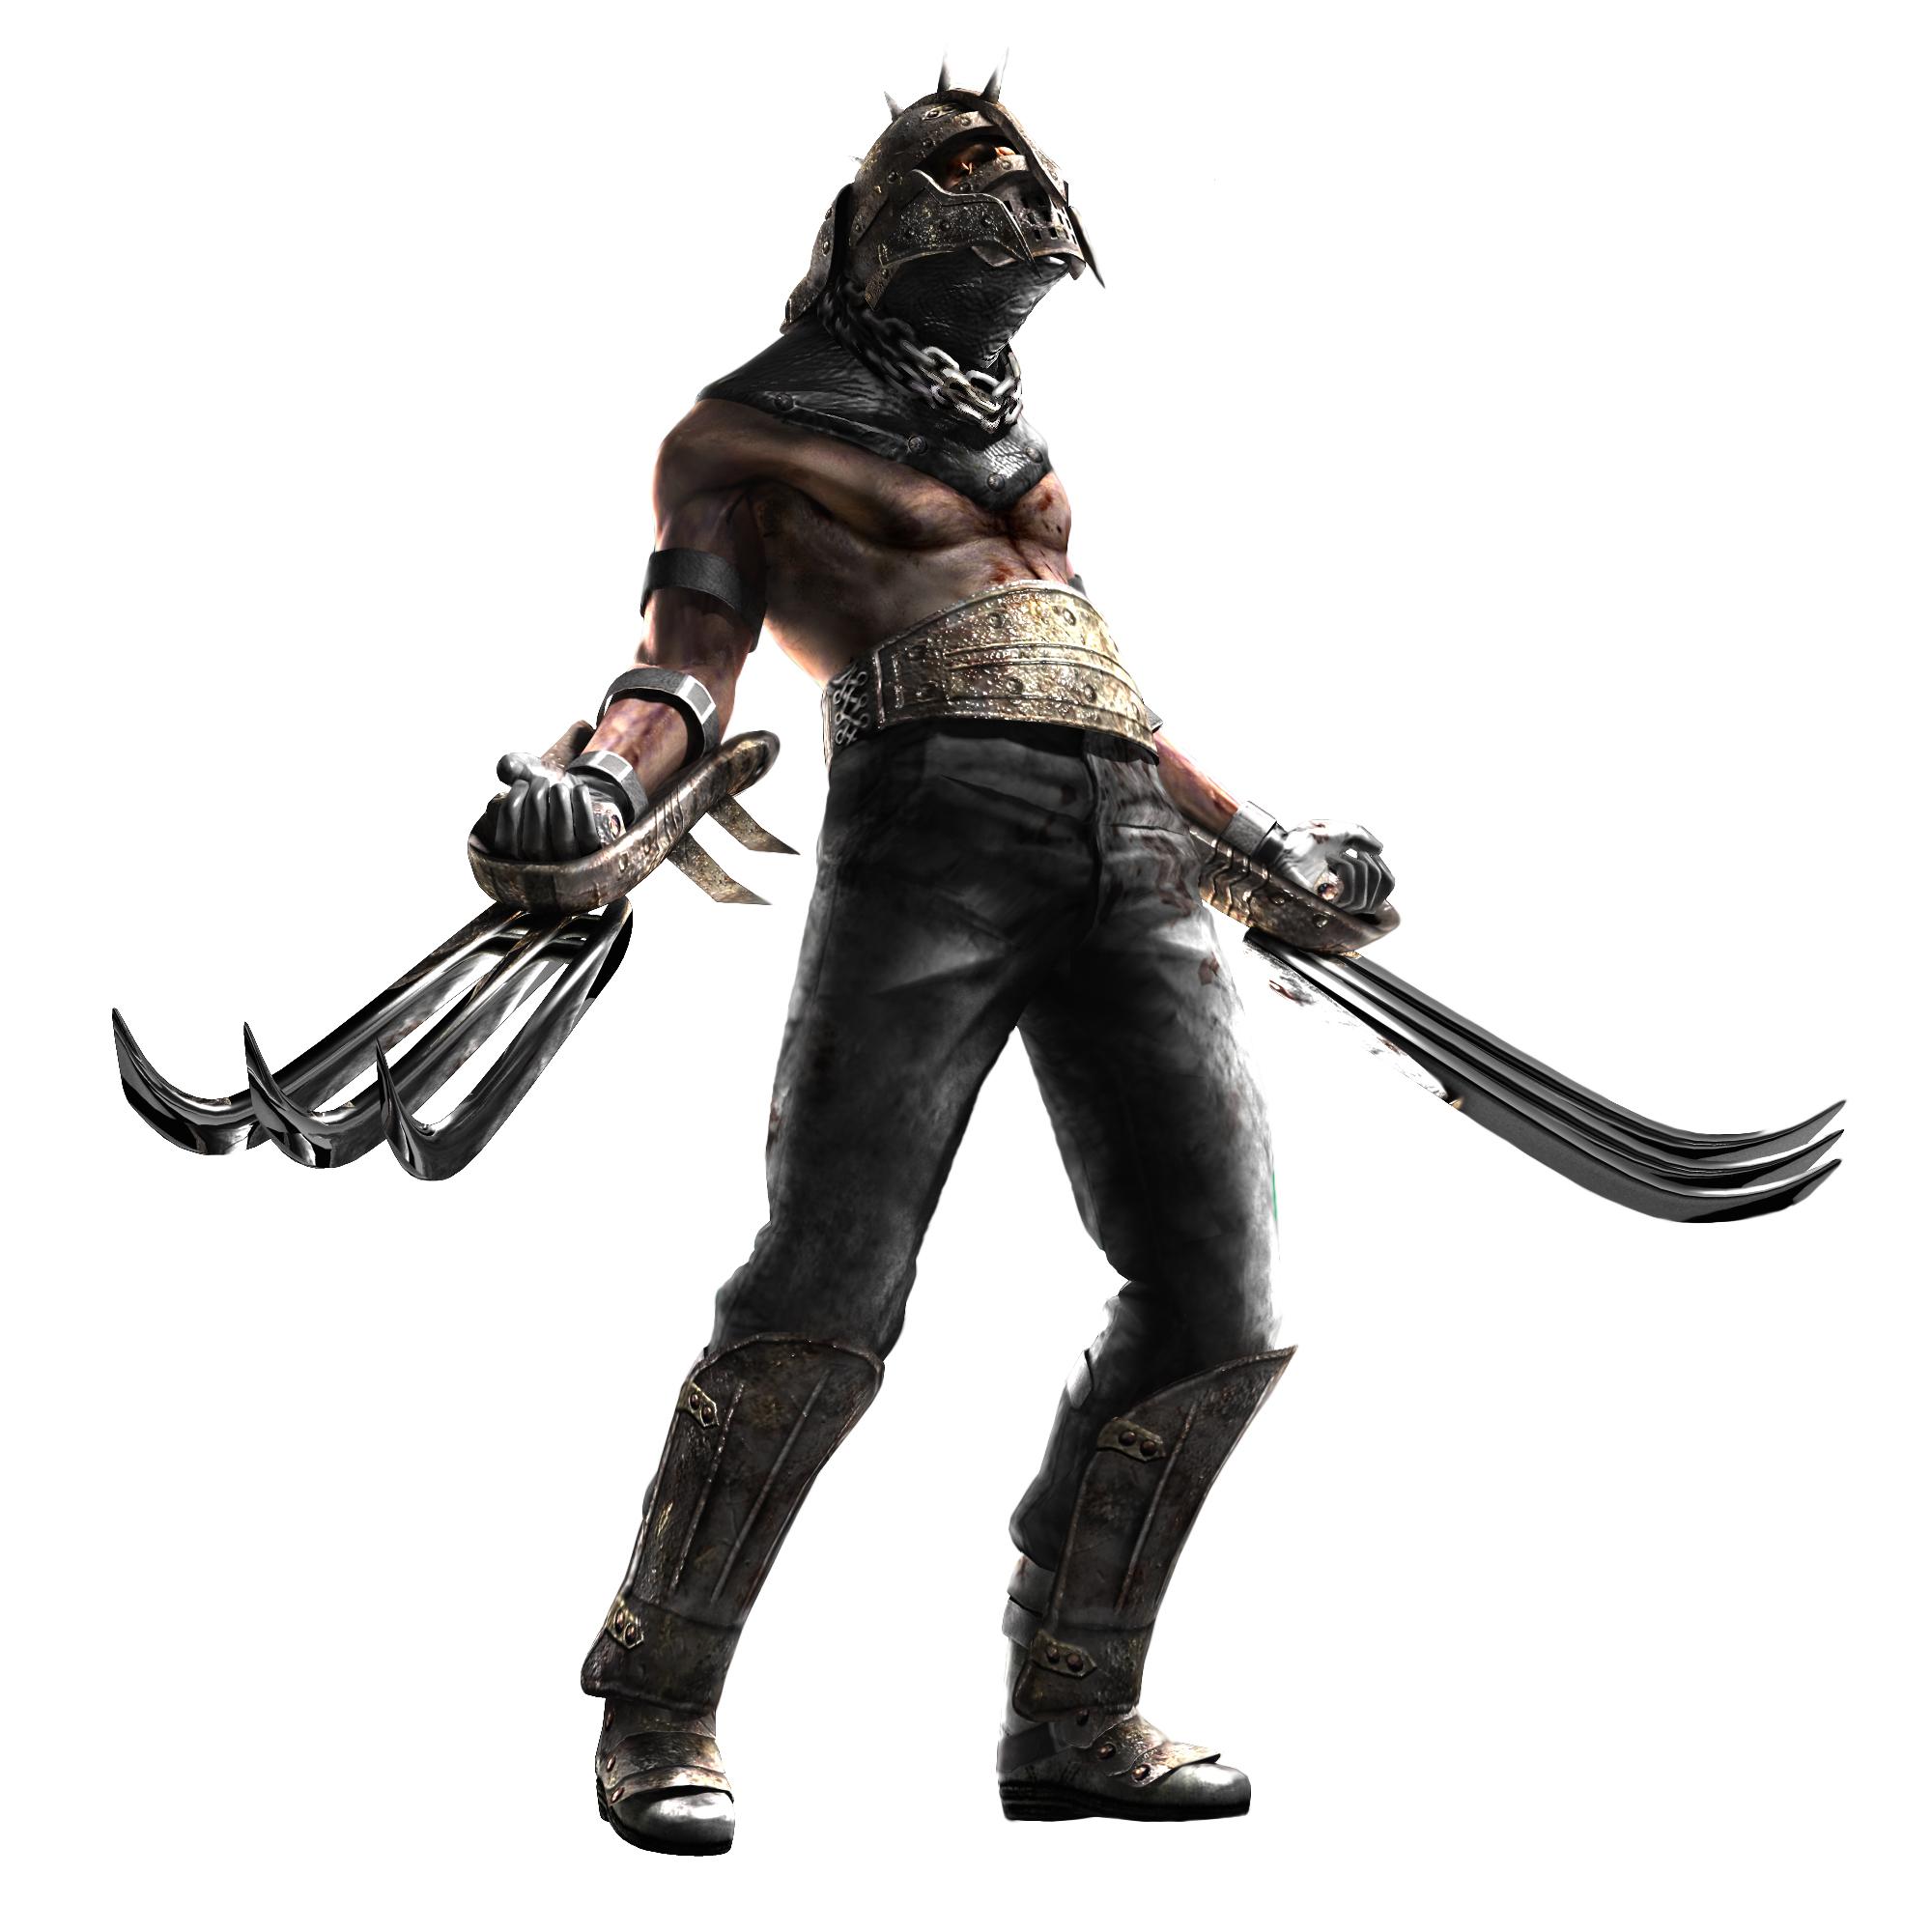 Biohazard 4 (Resident Evil 4) Re4-garrador